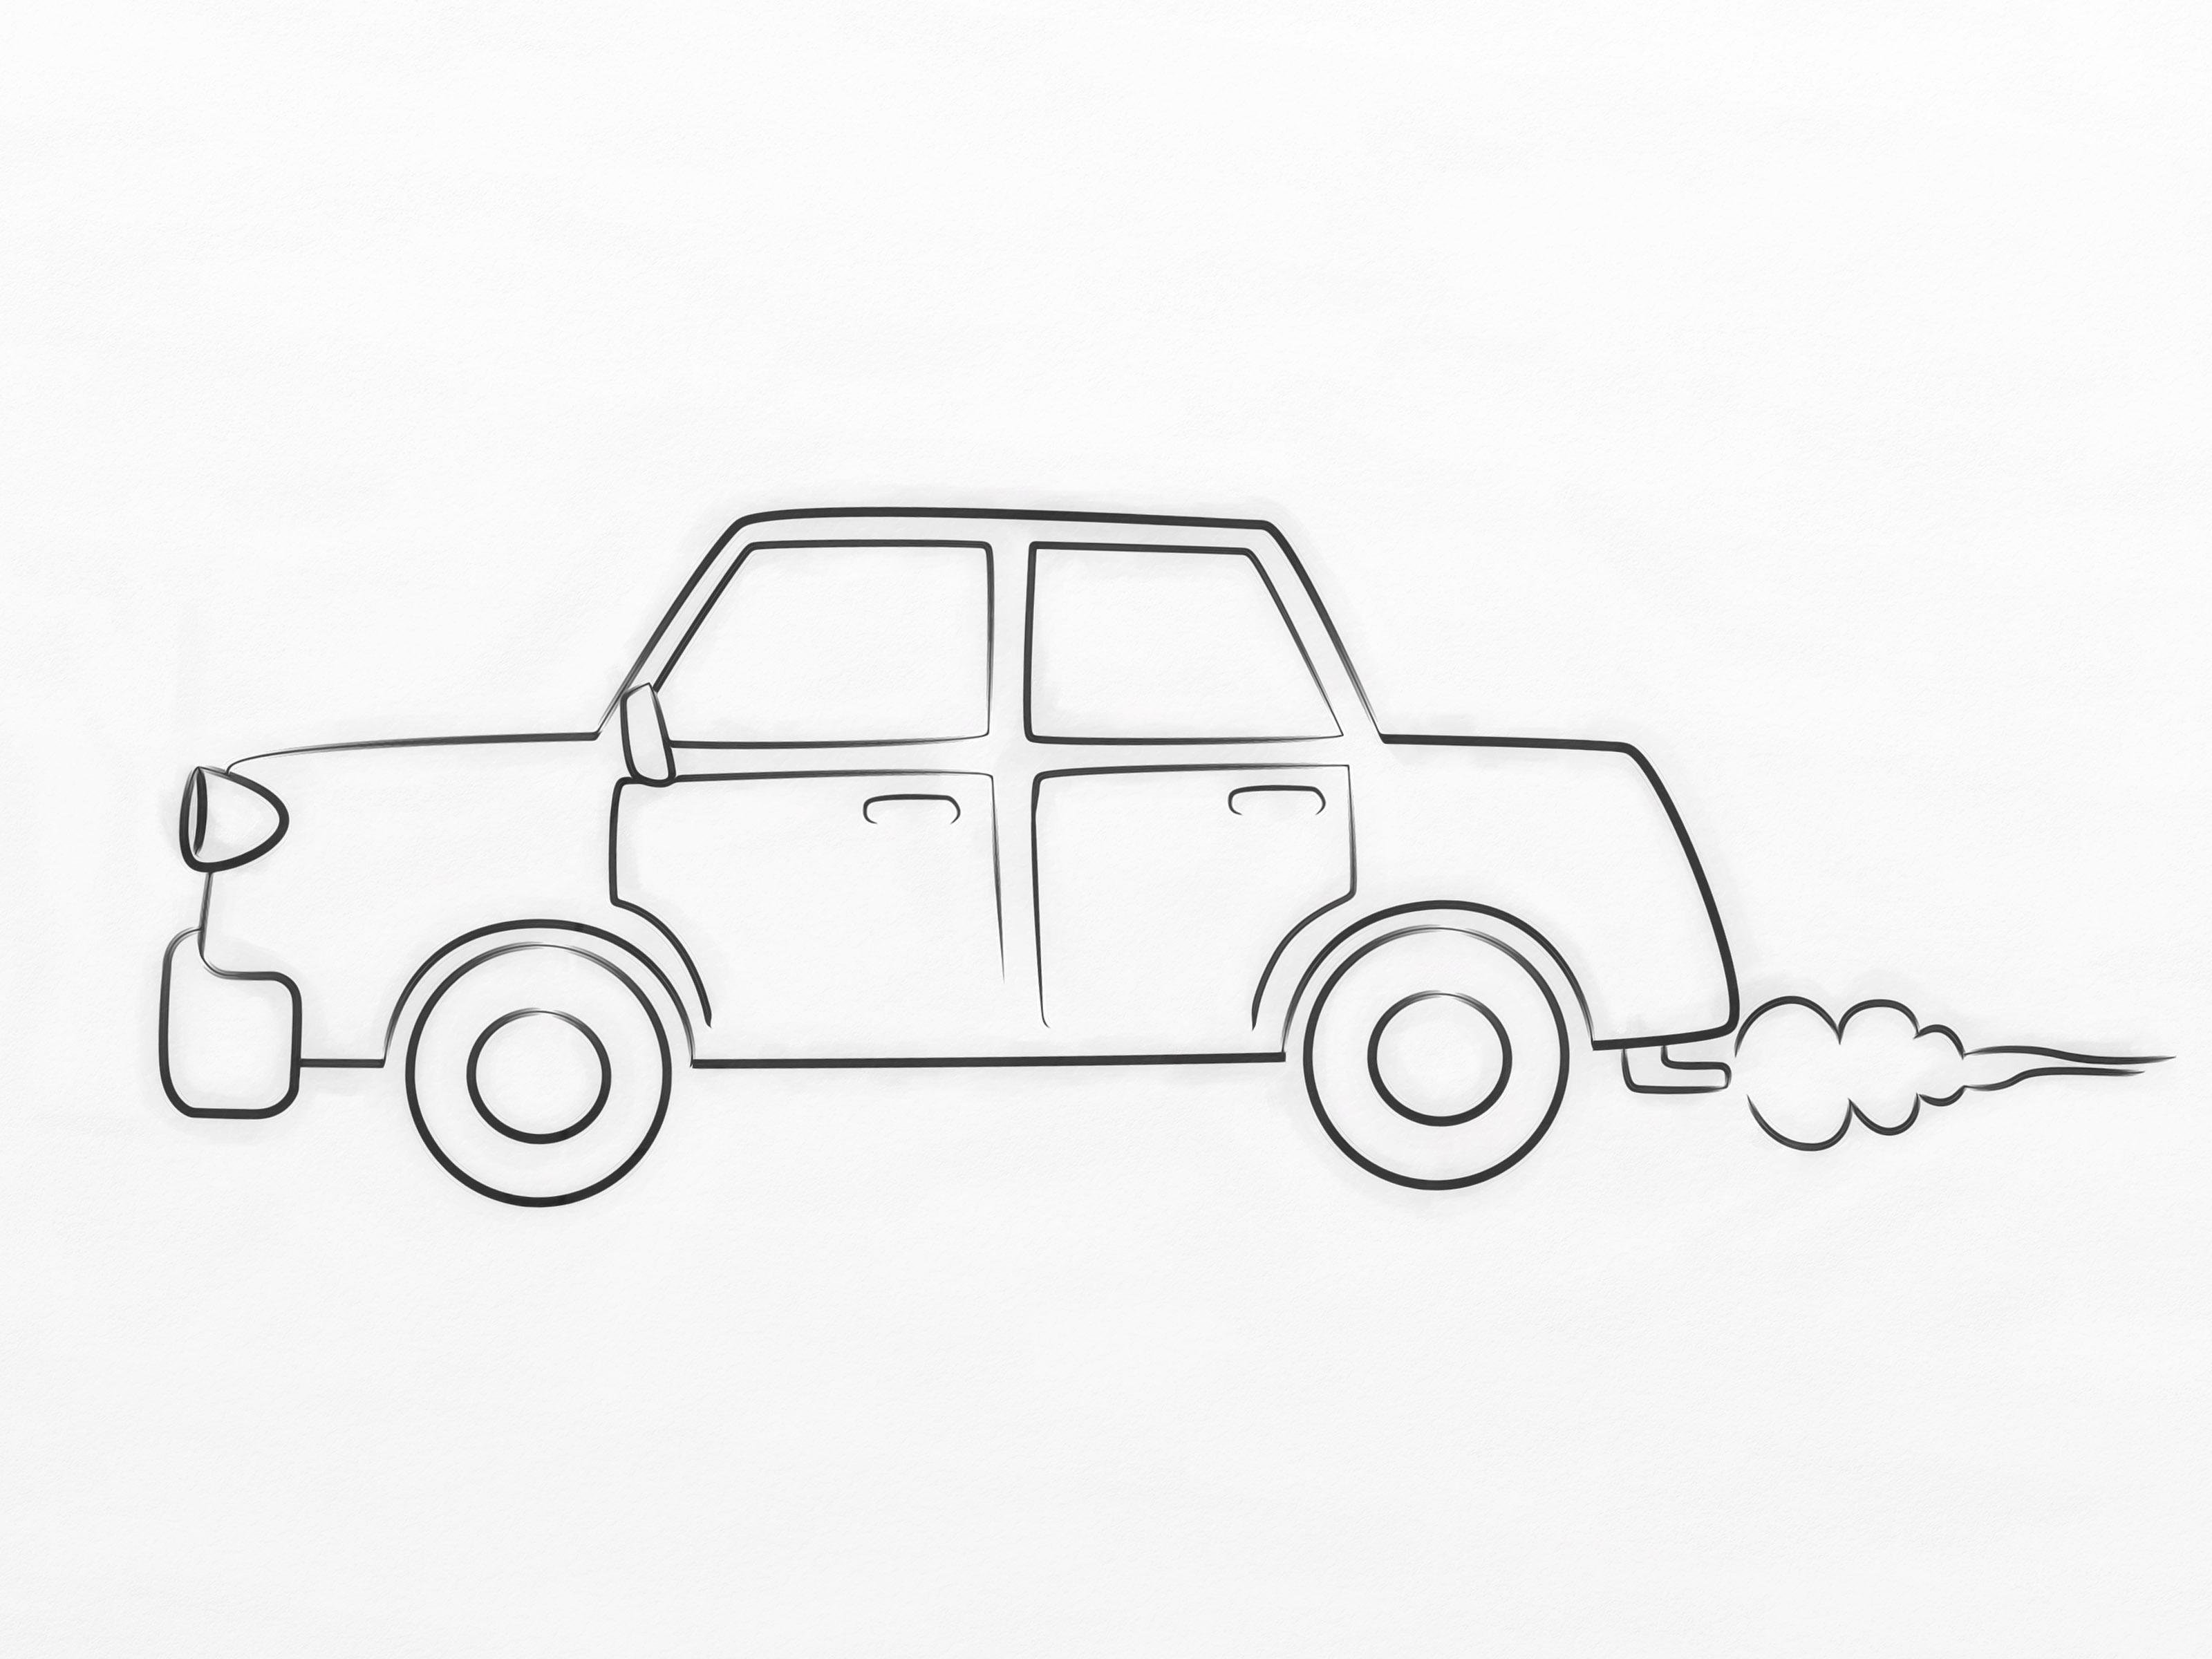 3200x2400 Car Drawing